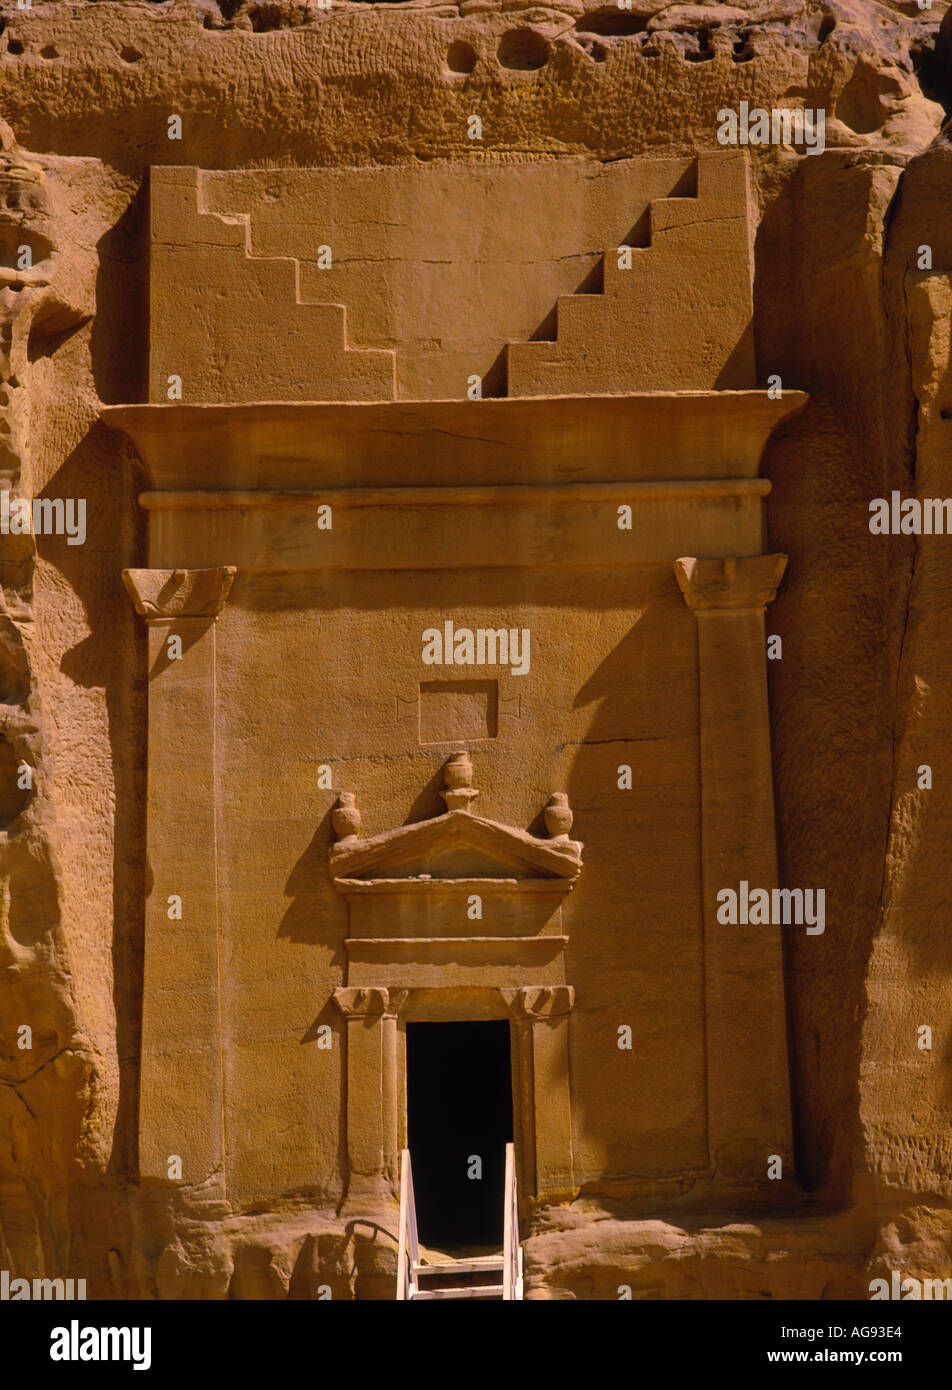 MADAIN SALAH ARABIA SAUDITA Asia Arabia Saudita Immagini Stock